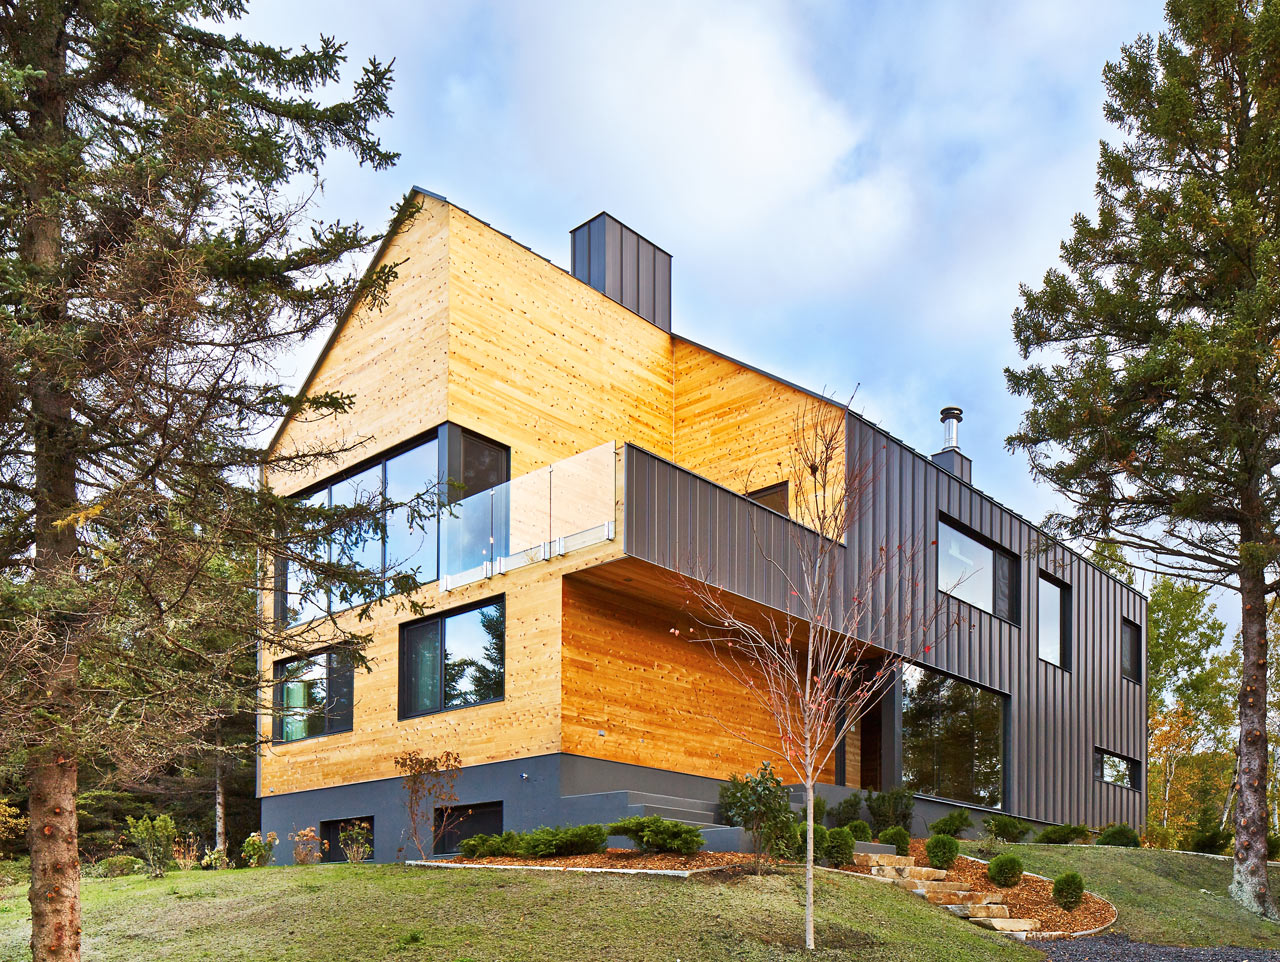 A Modern Barn-Like House by MU Architecture